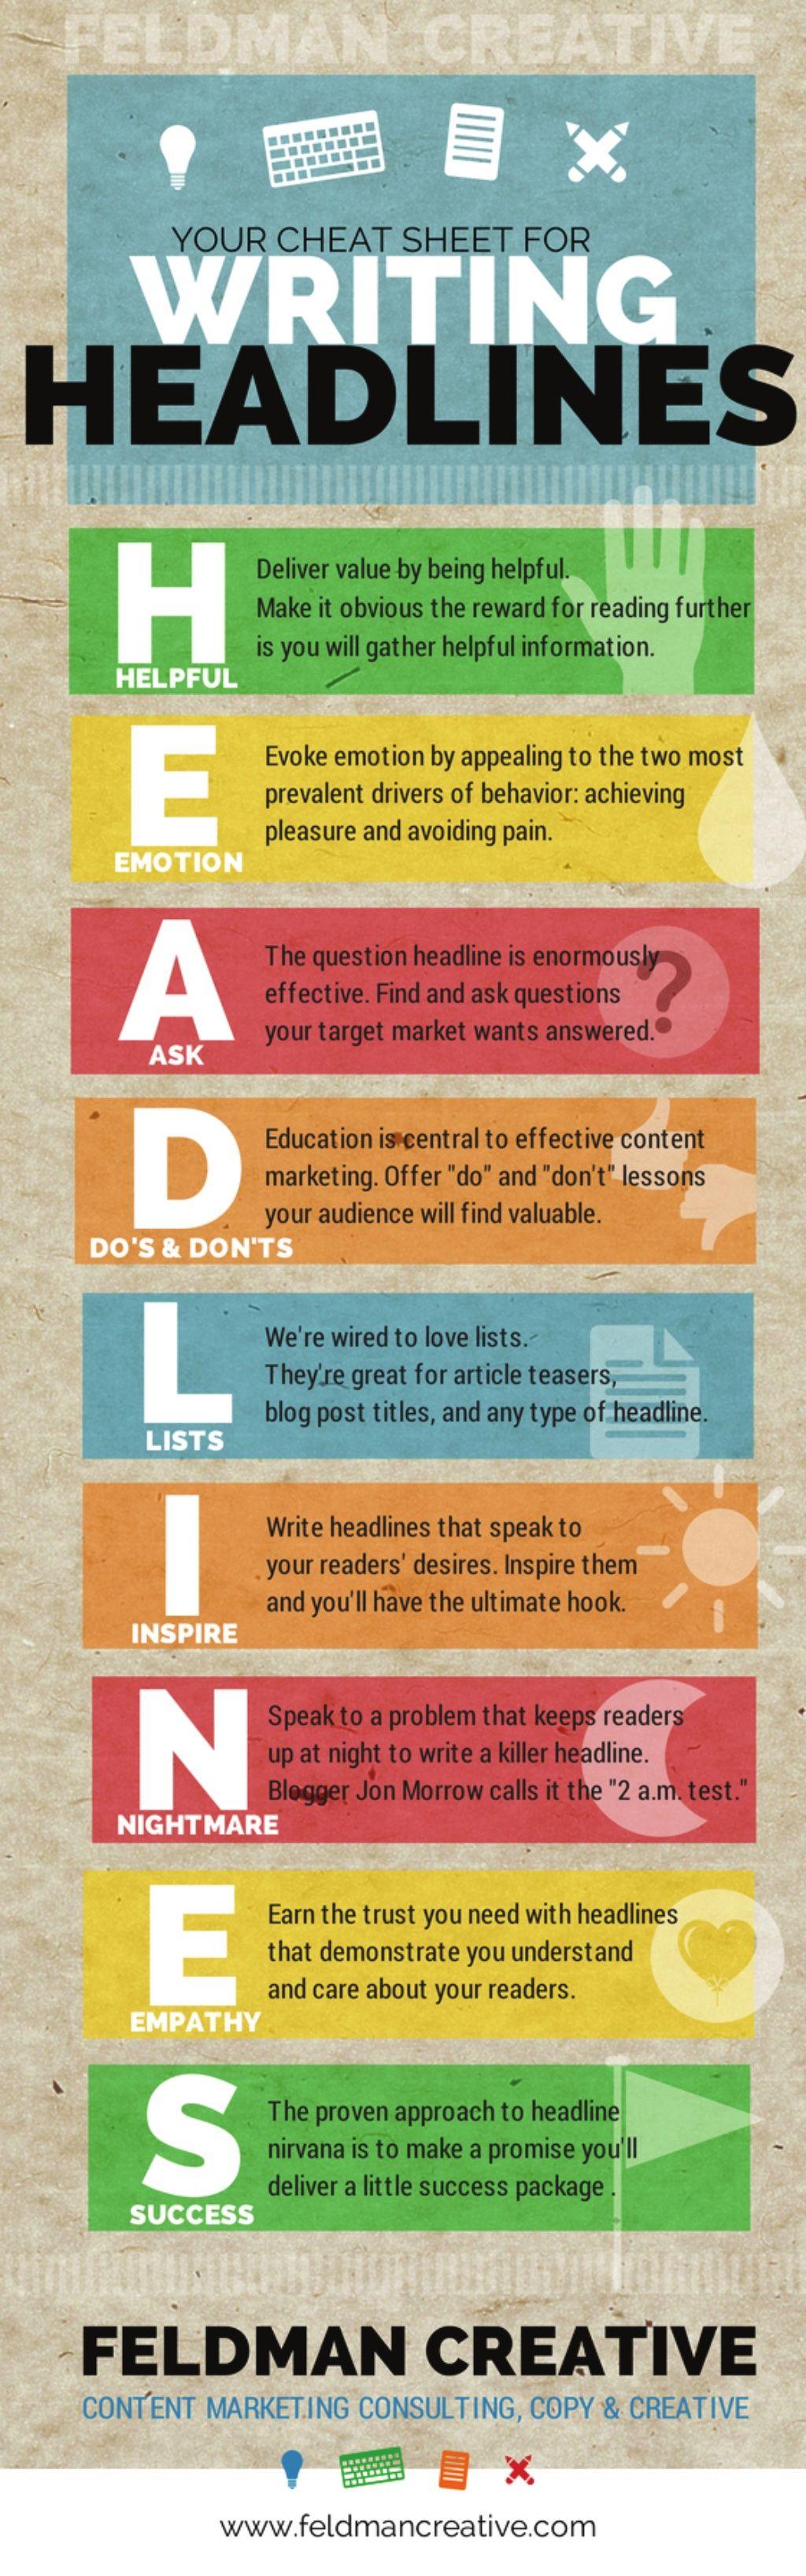 writing headlines infographic via  angela4design from barry feldman